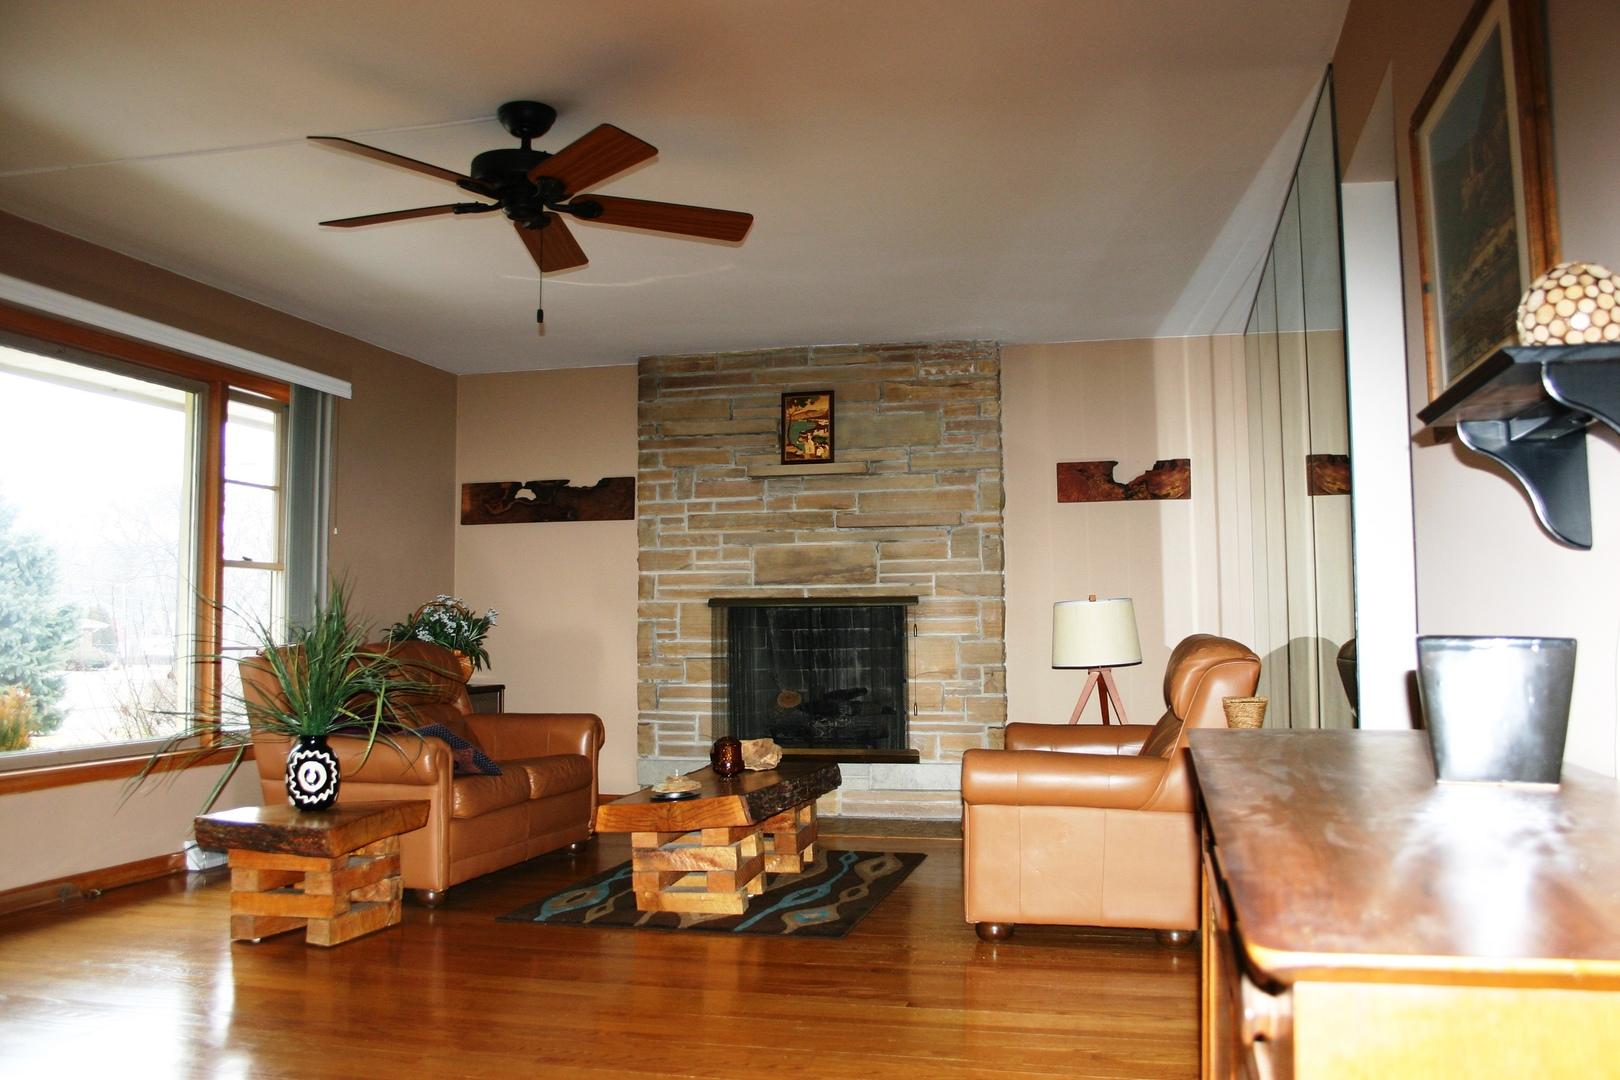 507 South Elmhurst, Mount Prospect, Illinois, 60056